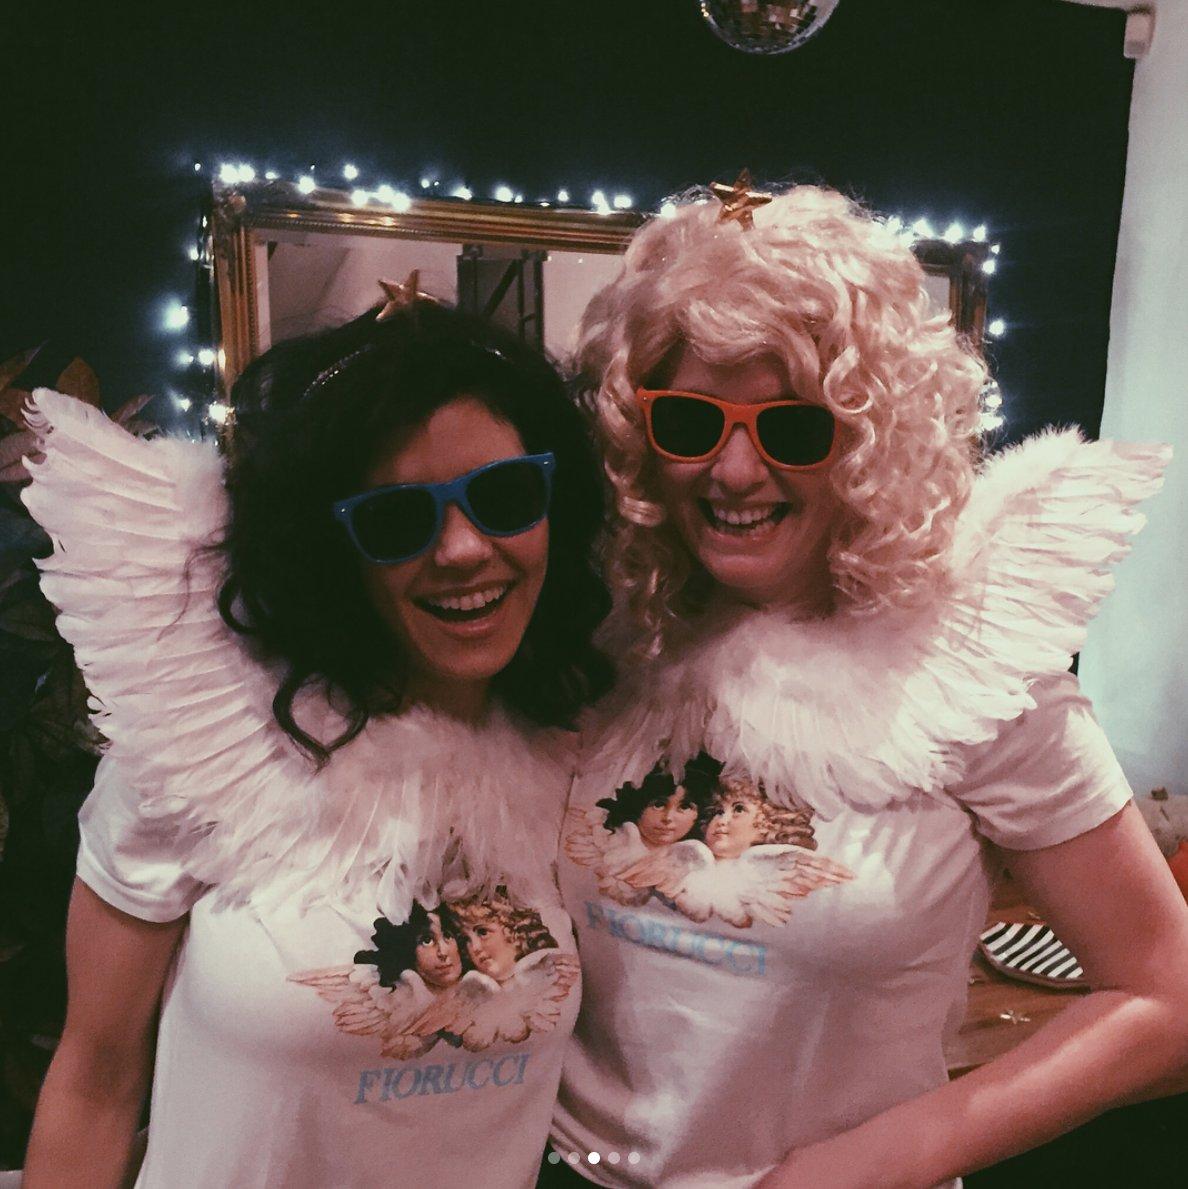 We went as Fiorucci angels for Halloween! ��������⭐️�������� https://t.co/T8d2DfP2kJ